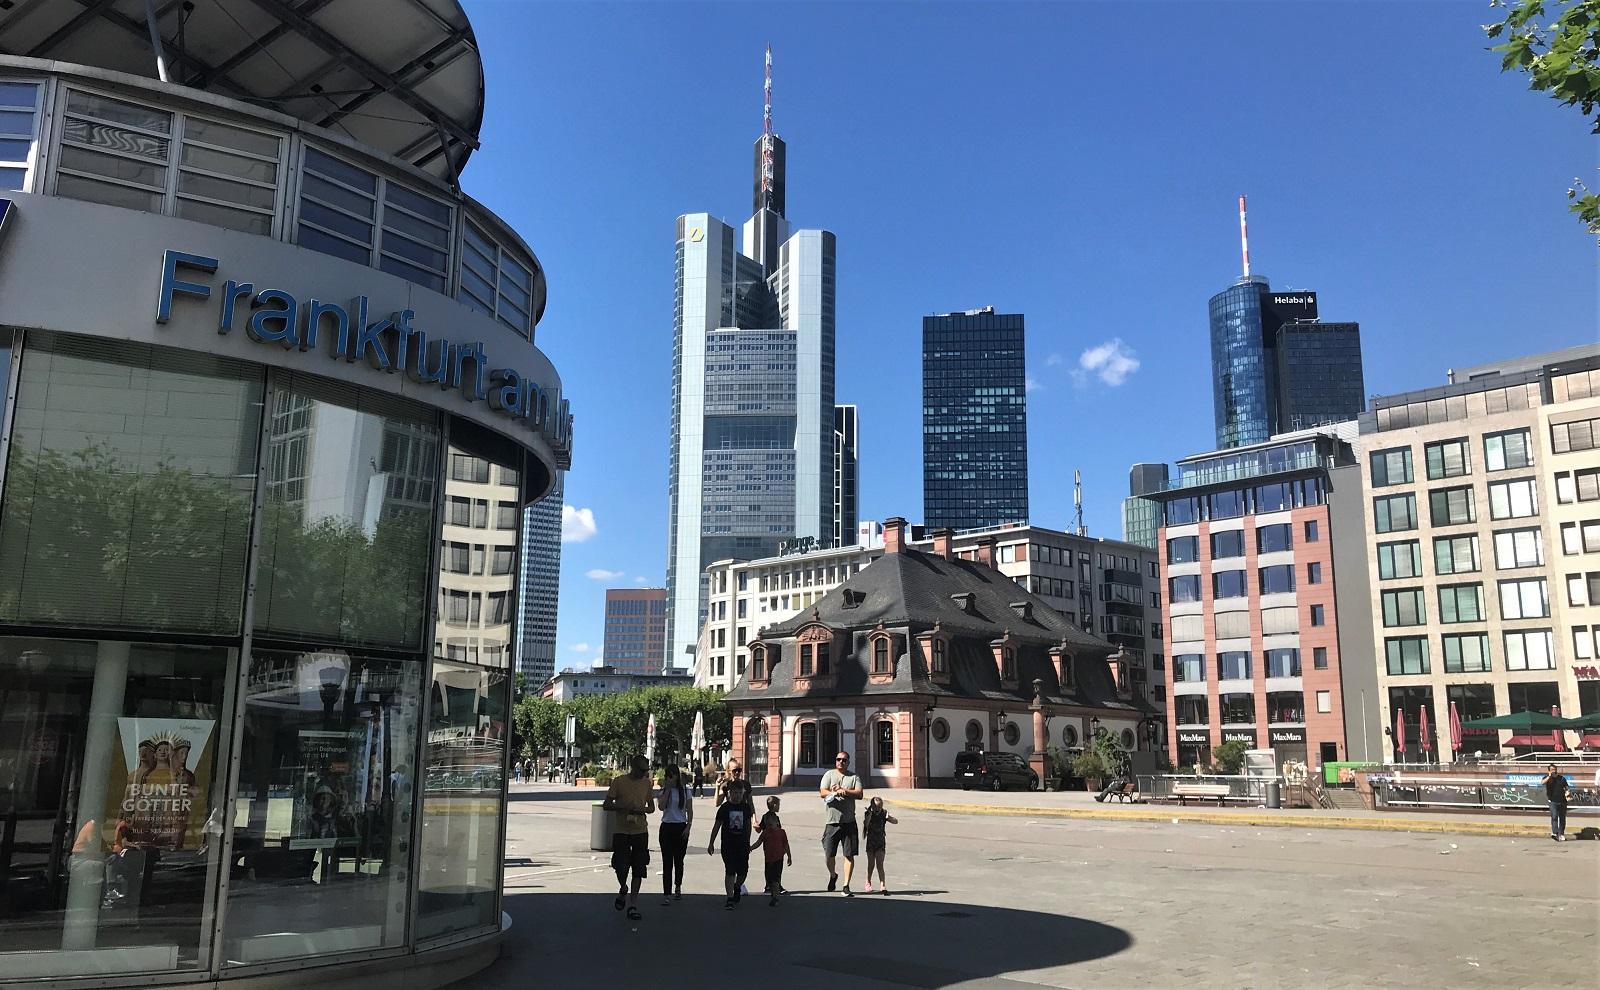 Frankfurt-01-K